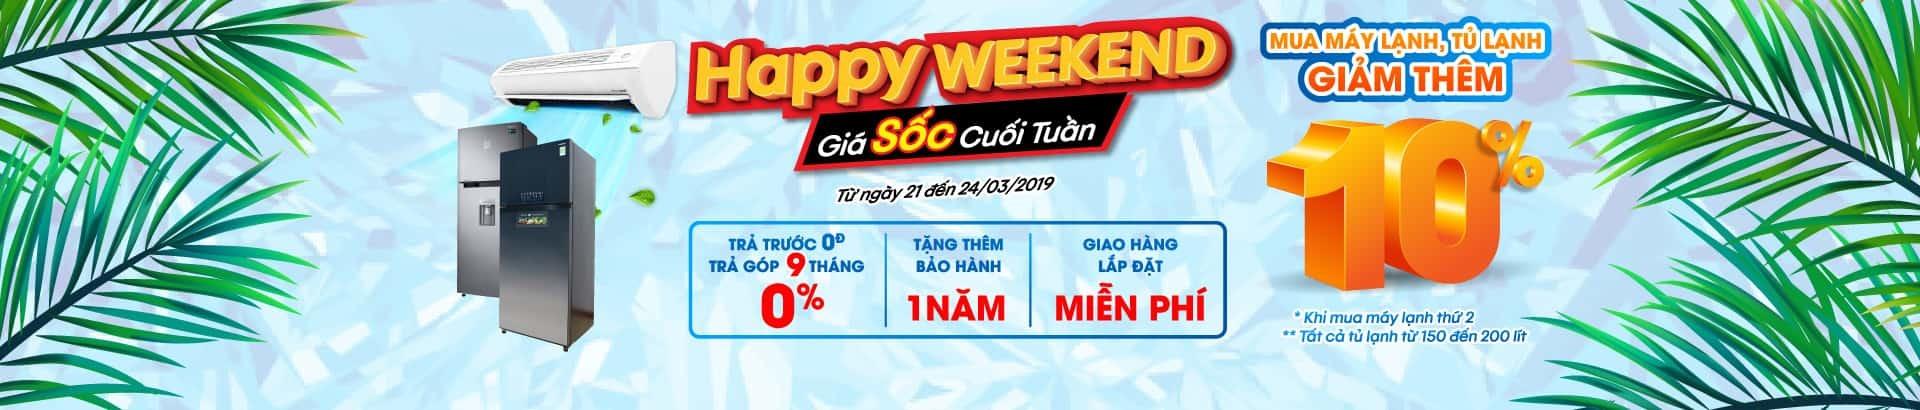 Happy Weekend<br/>giá sốc cuối tuần